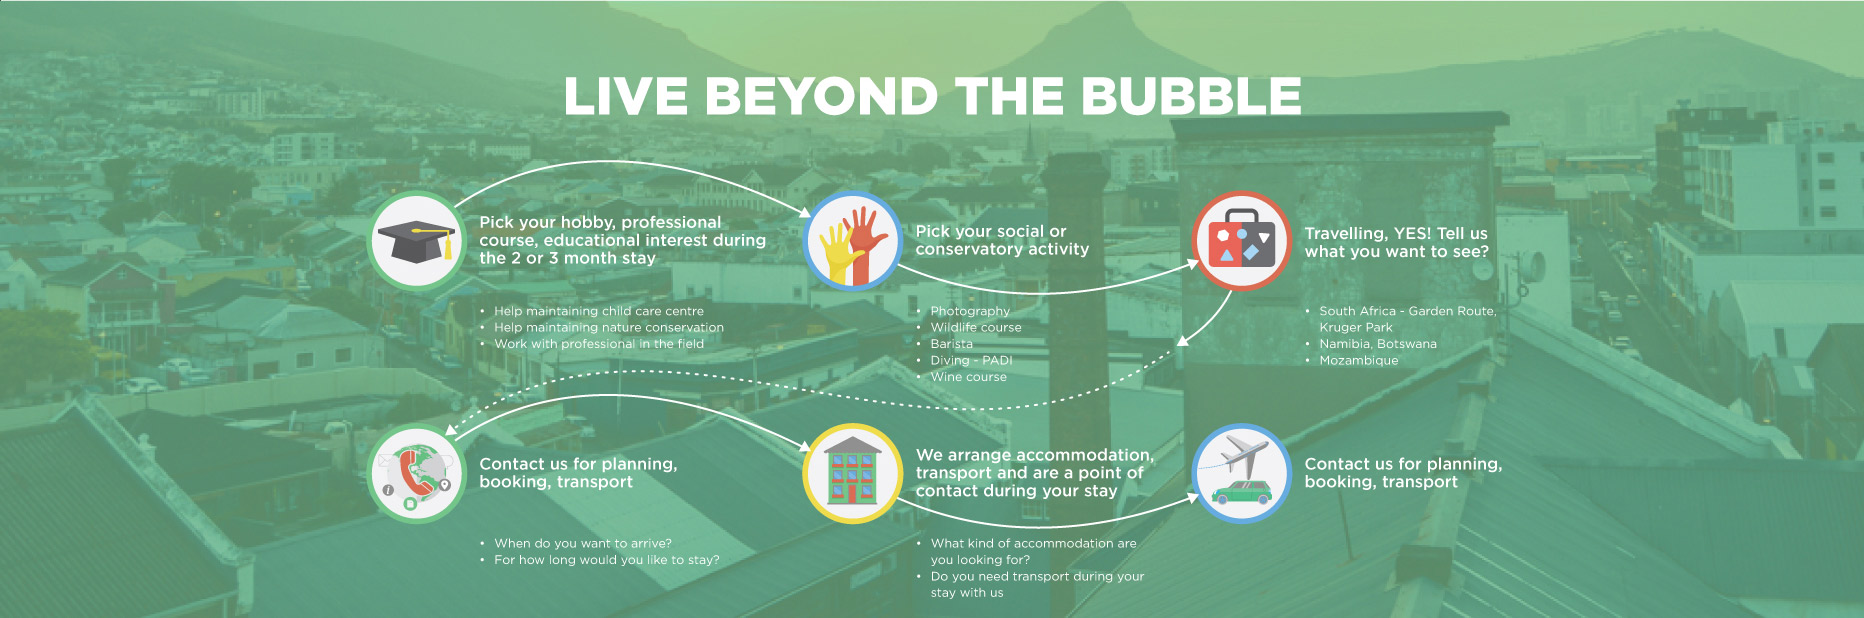 live beyond the bubble